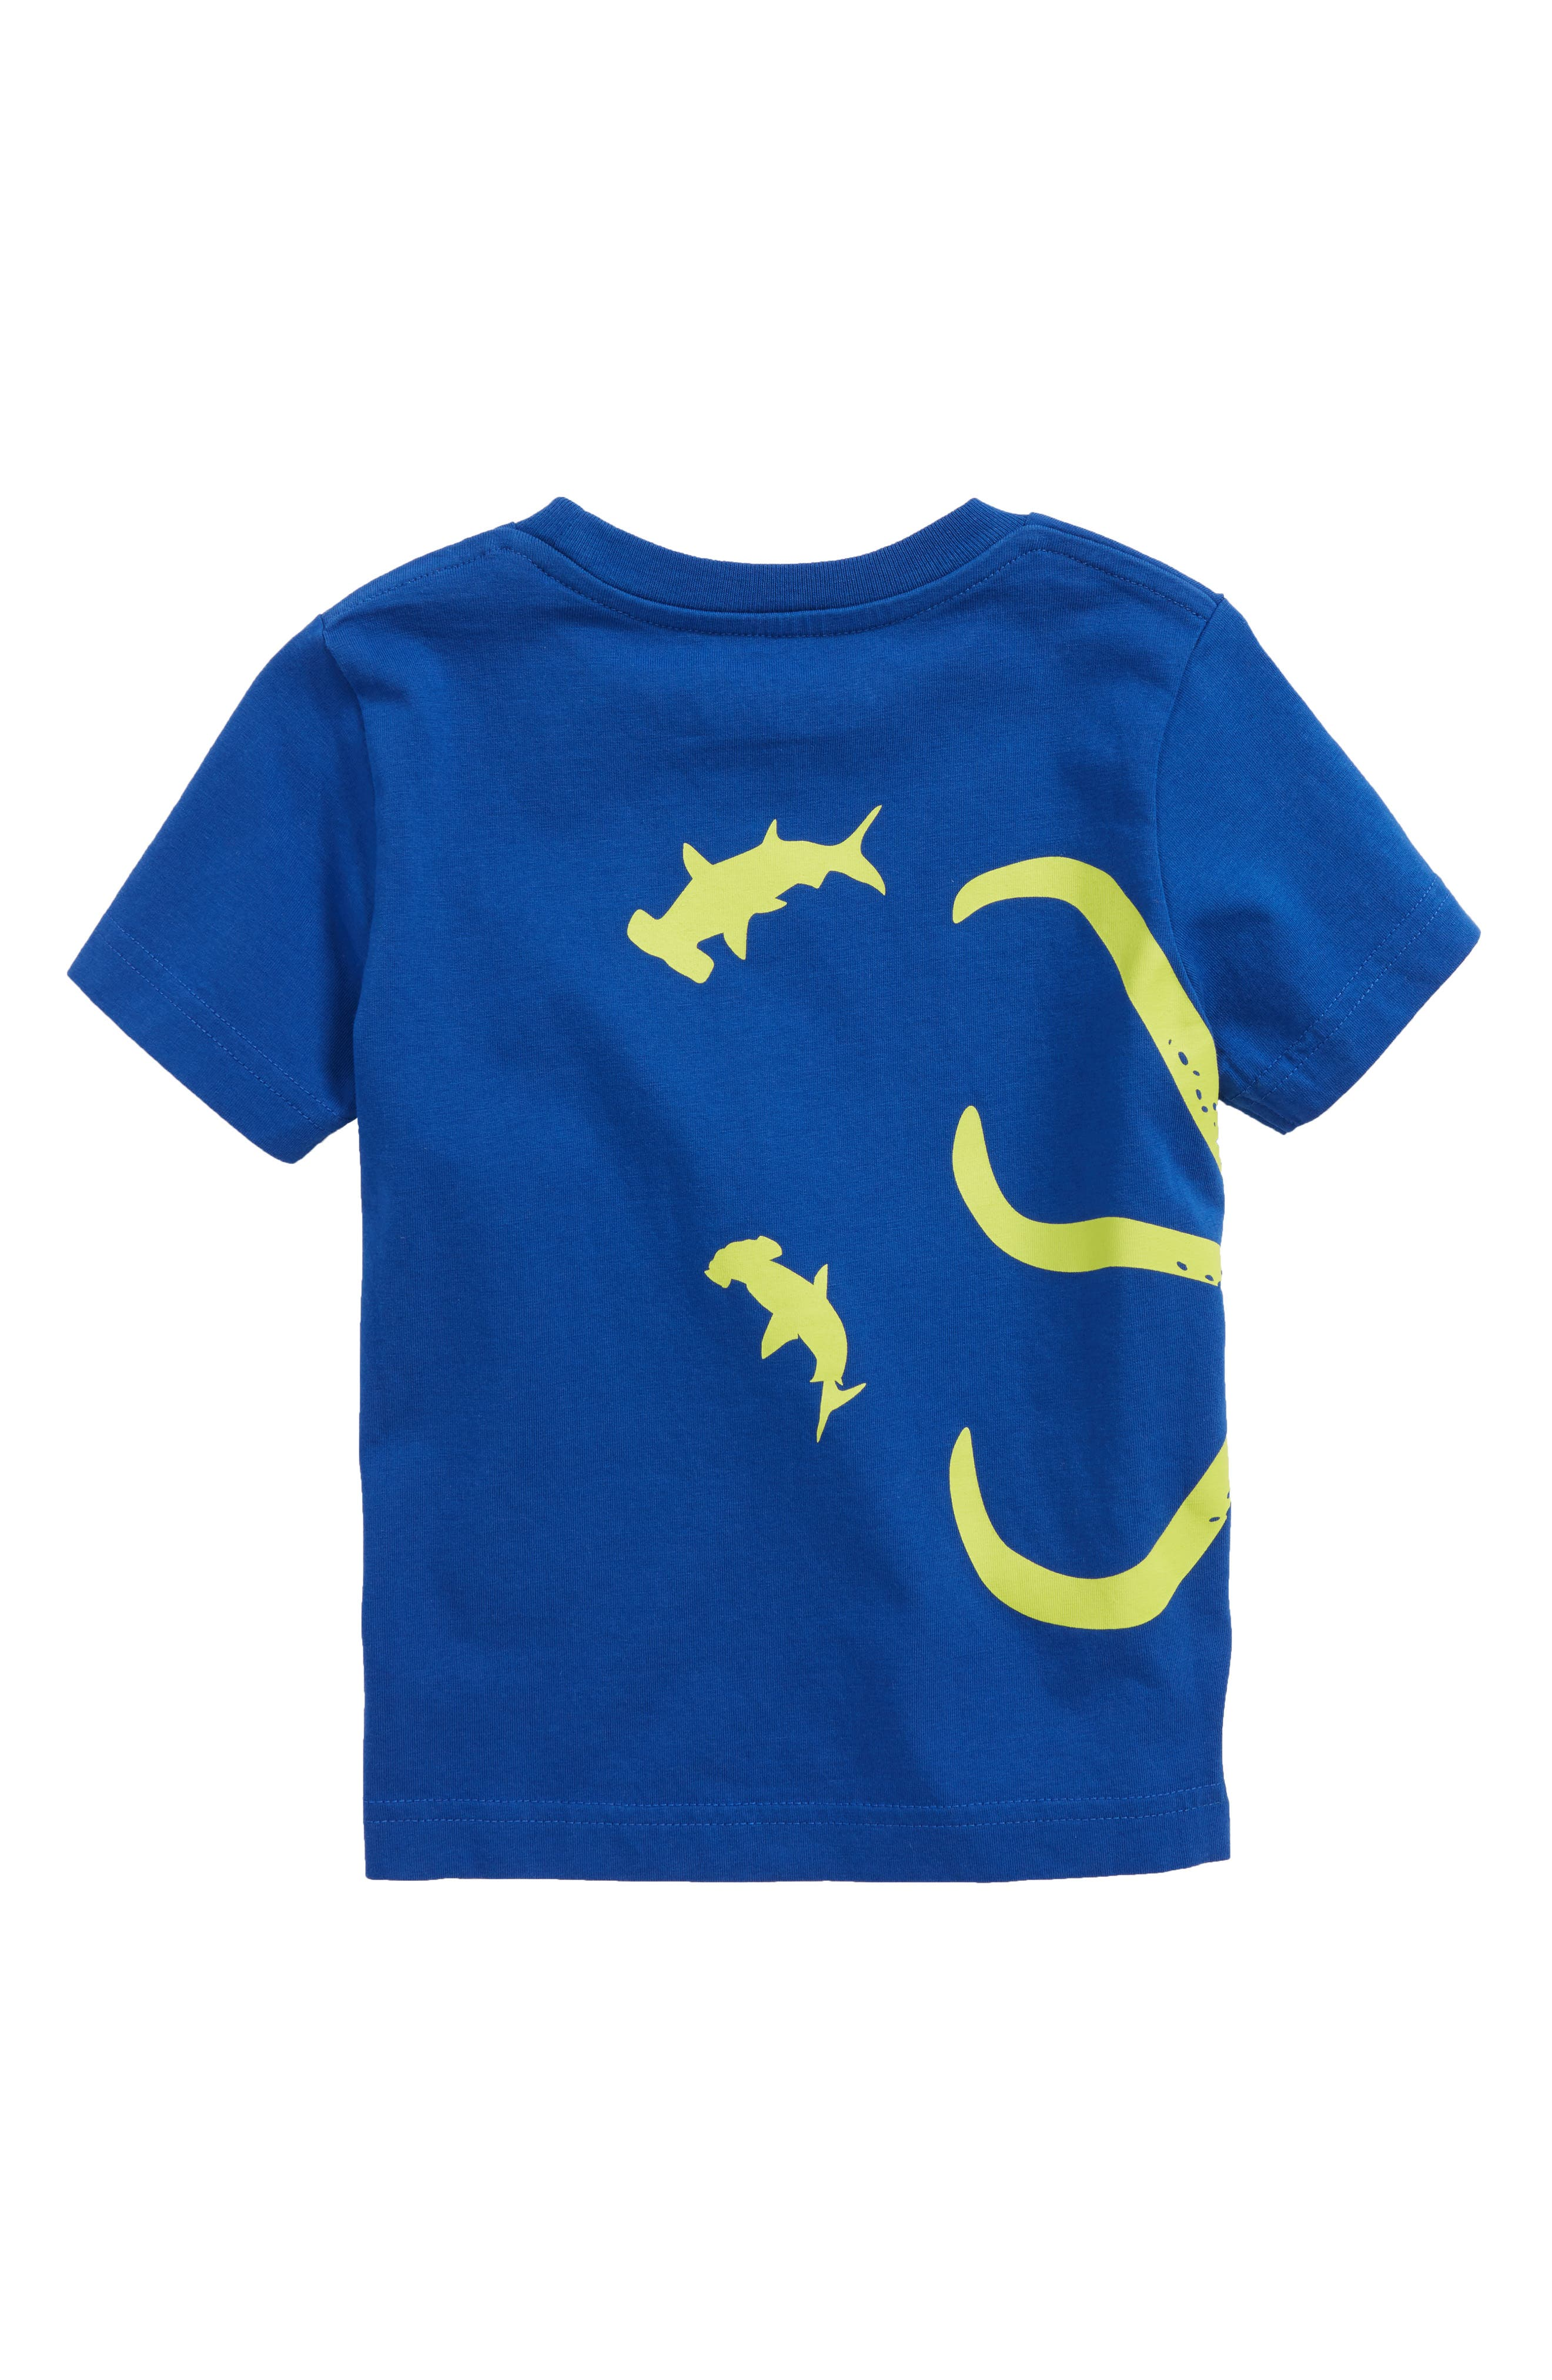 Wraparound Octopus T-Shirt,                             Alternate thumbnail 2, color,                             Orion Blue Octopus